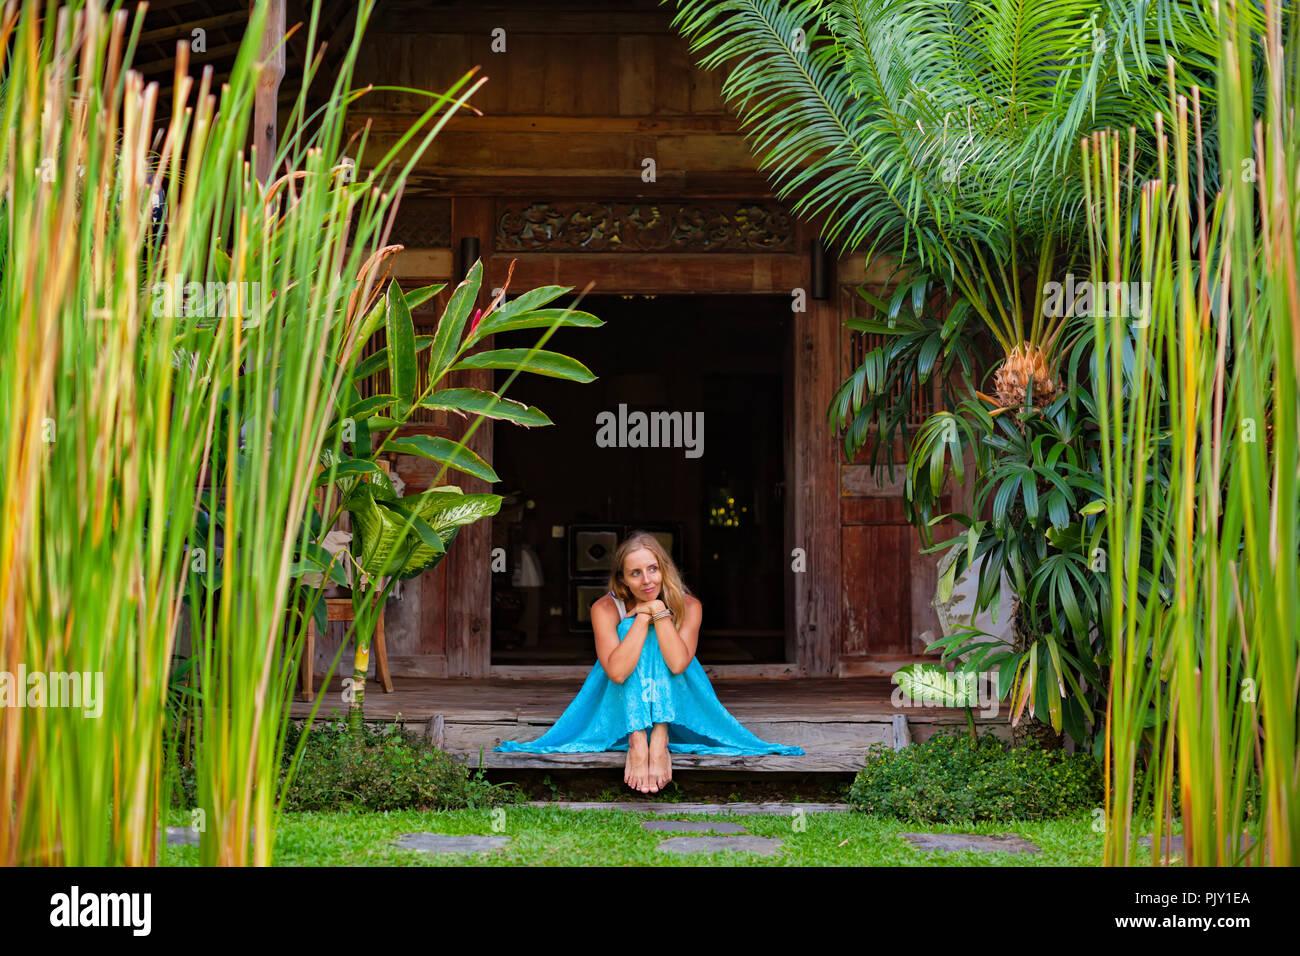 Attractive girl sit on open-air veranda of wooden bungalow, enjoying beautiful tropical garden view. Young woman relaxing in luxury villa Stock Photo